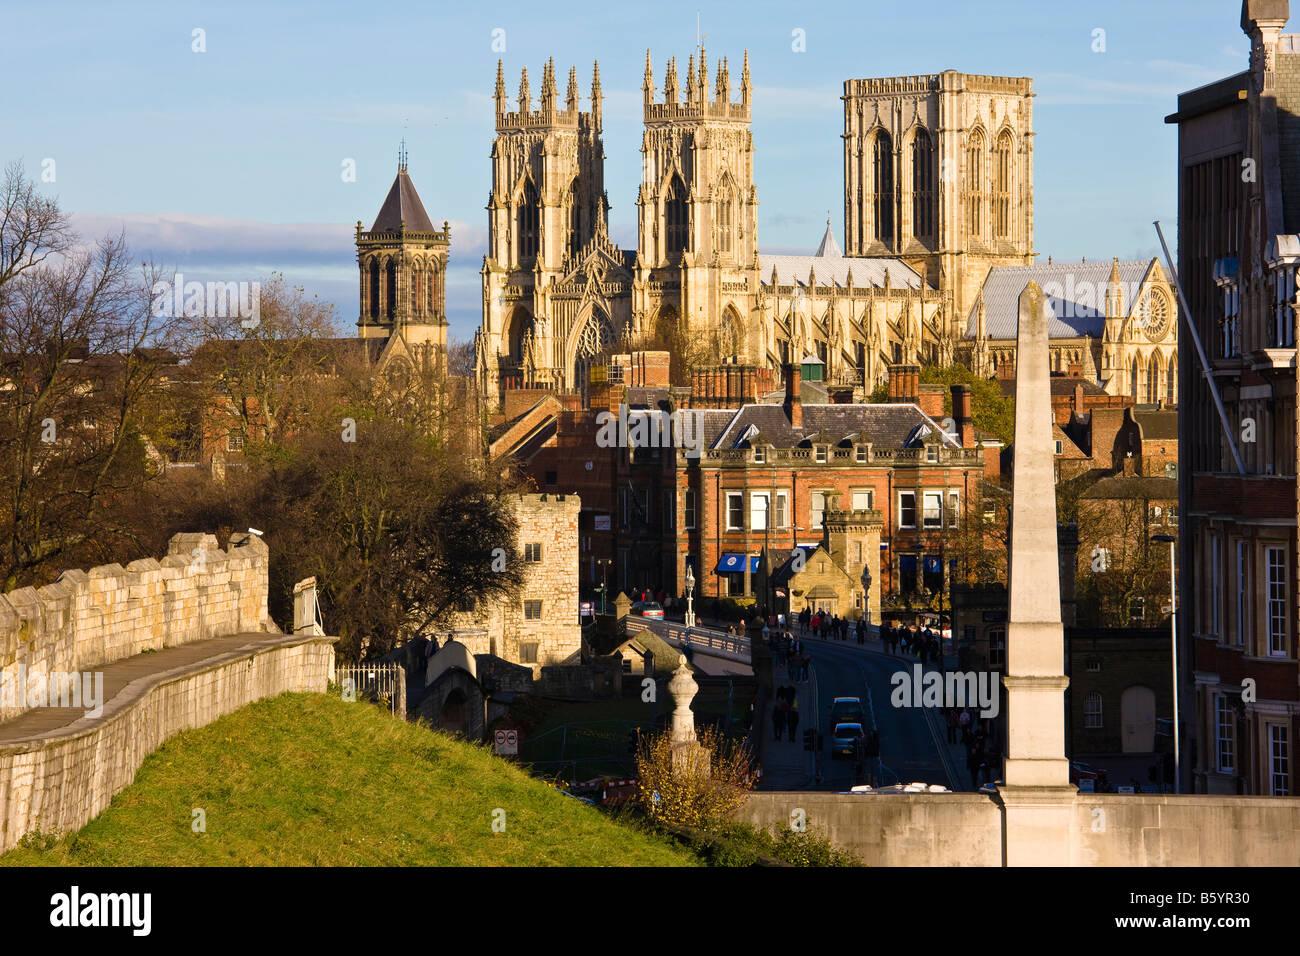 York Minster Yorkshire England - Stock Image